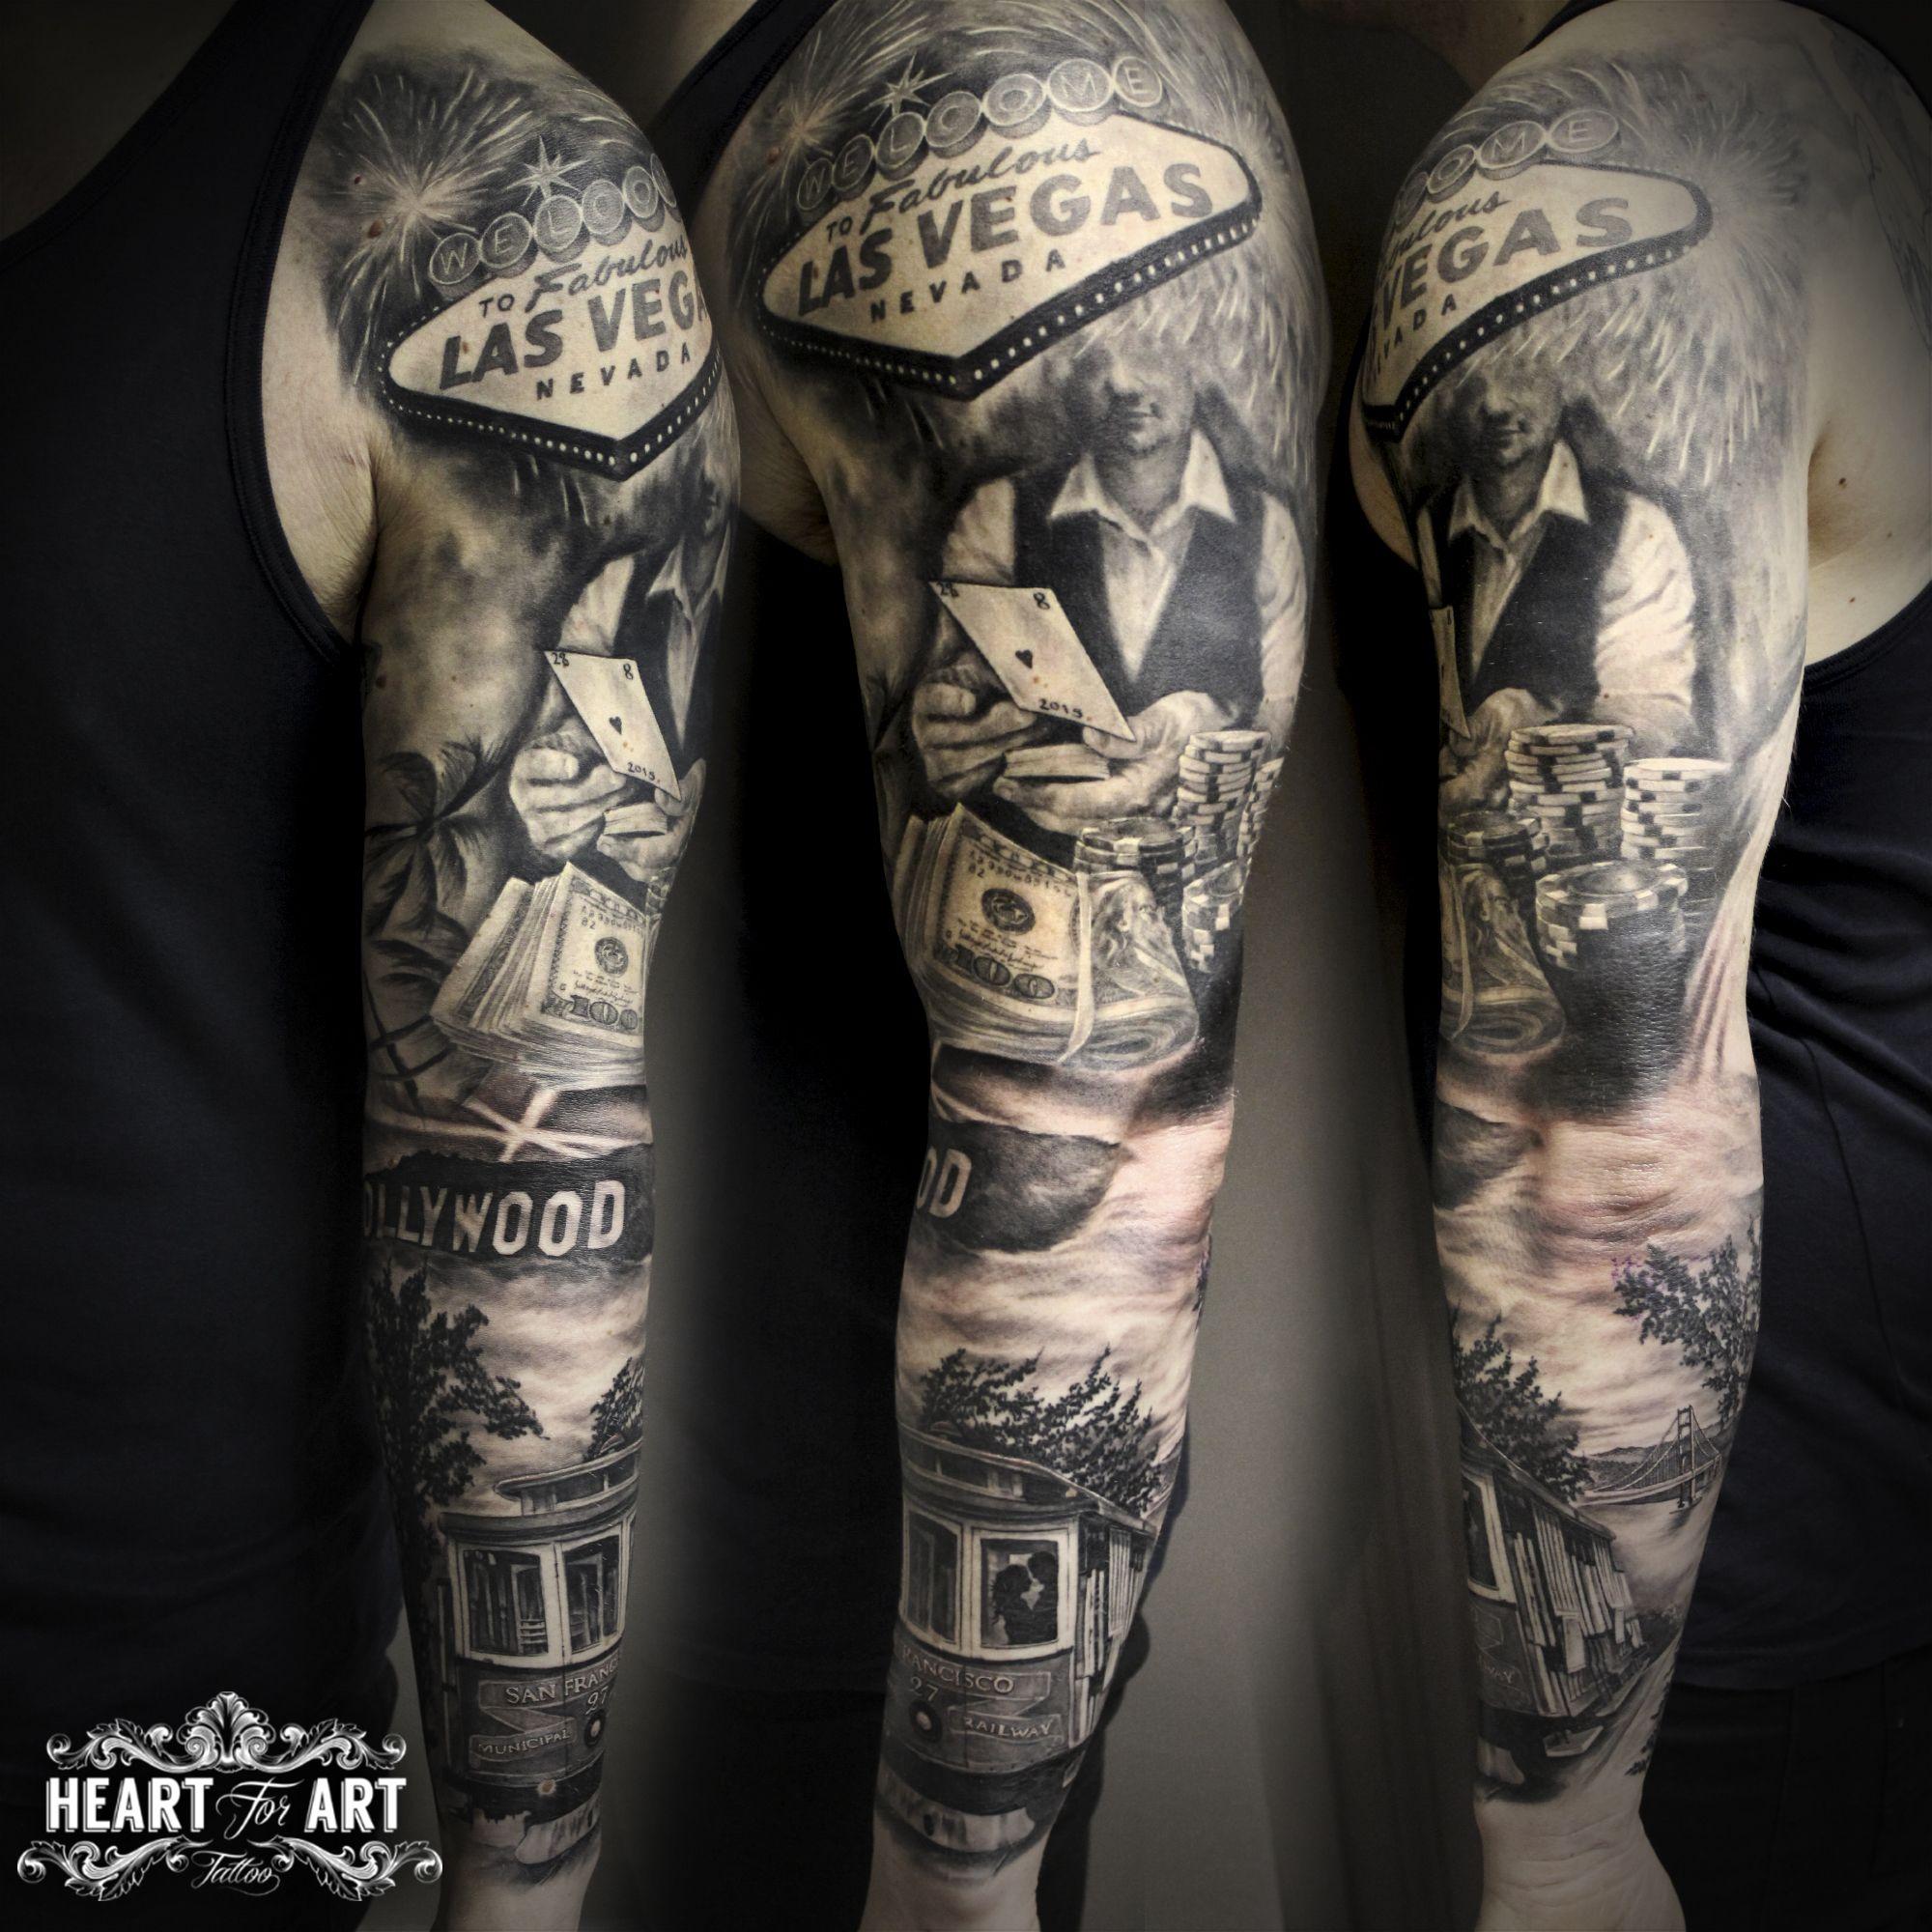 28 tattoos in vegas las vegas thigh tattoo love it